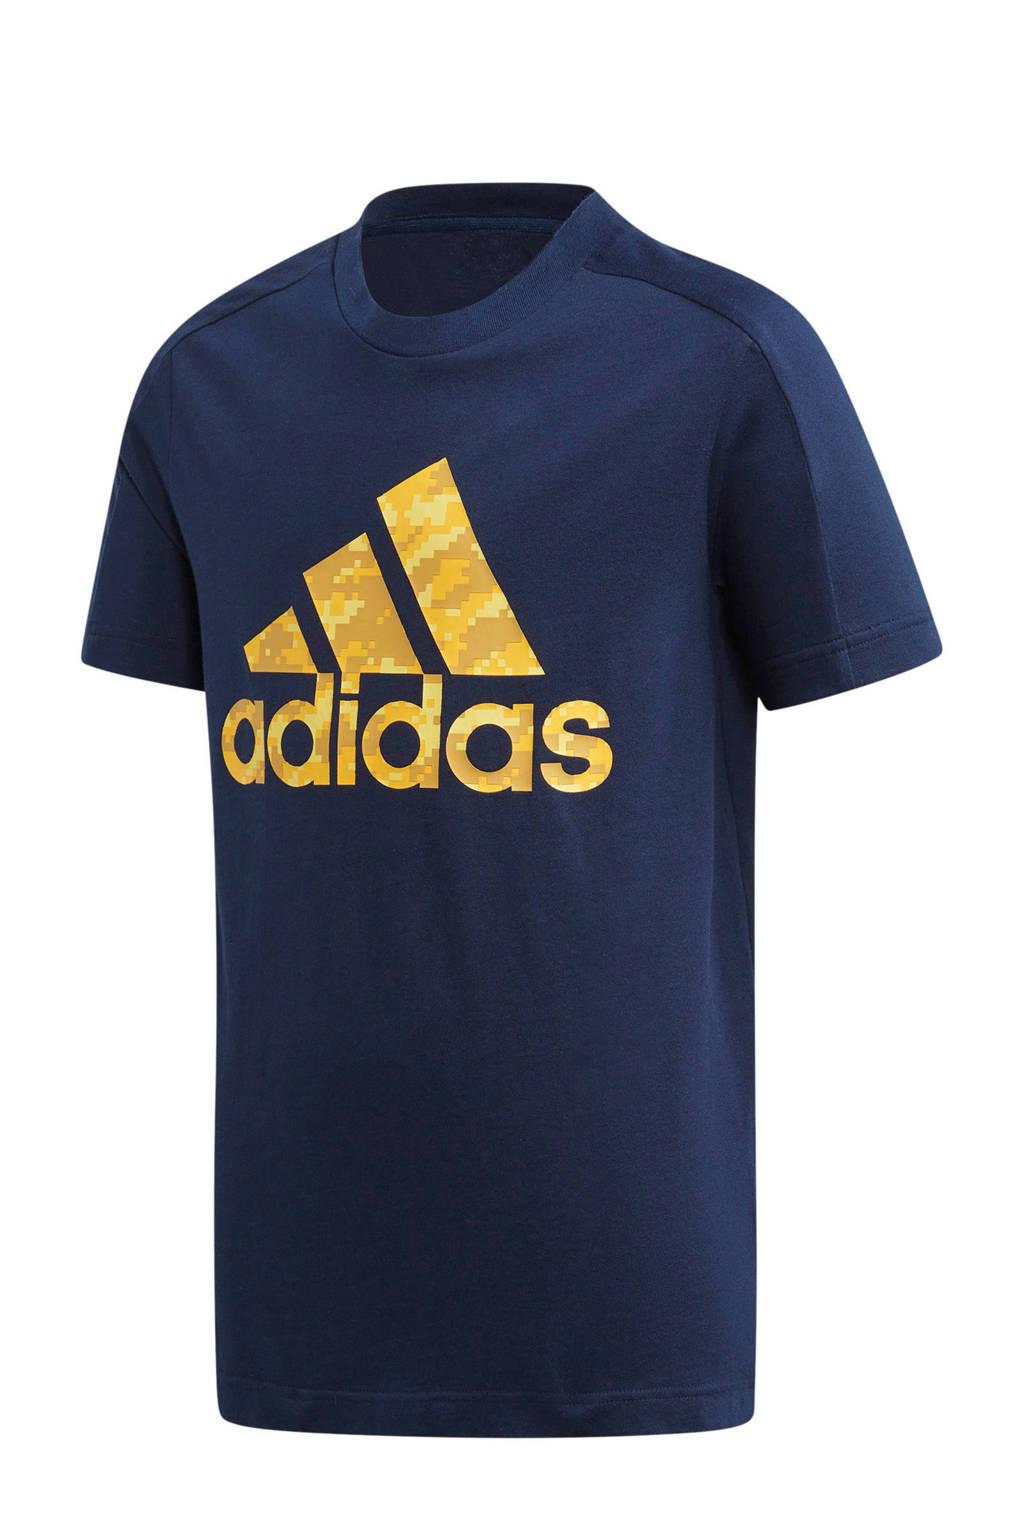 adidas   sport T-shirt donkerblauw, Donkerblauw/geel